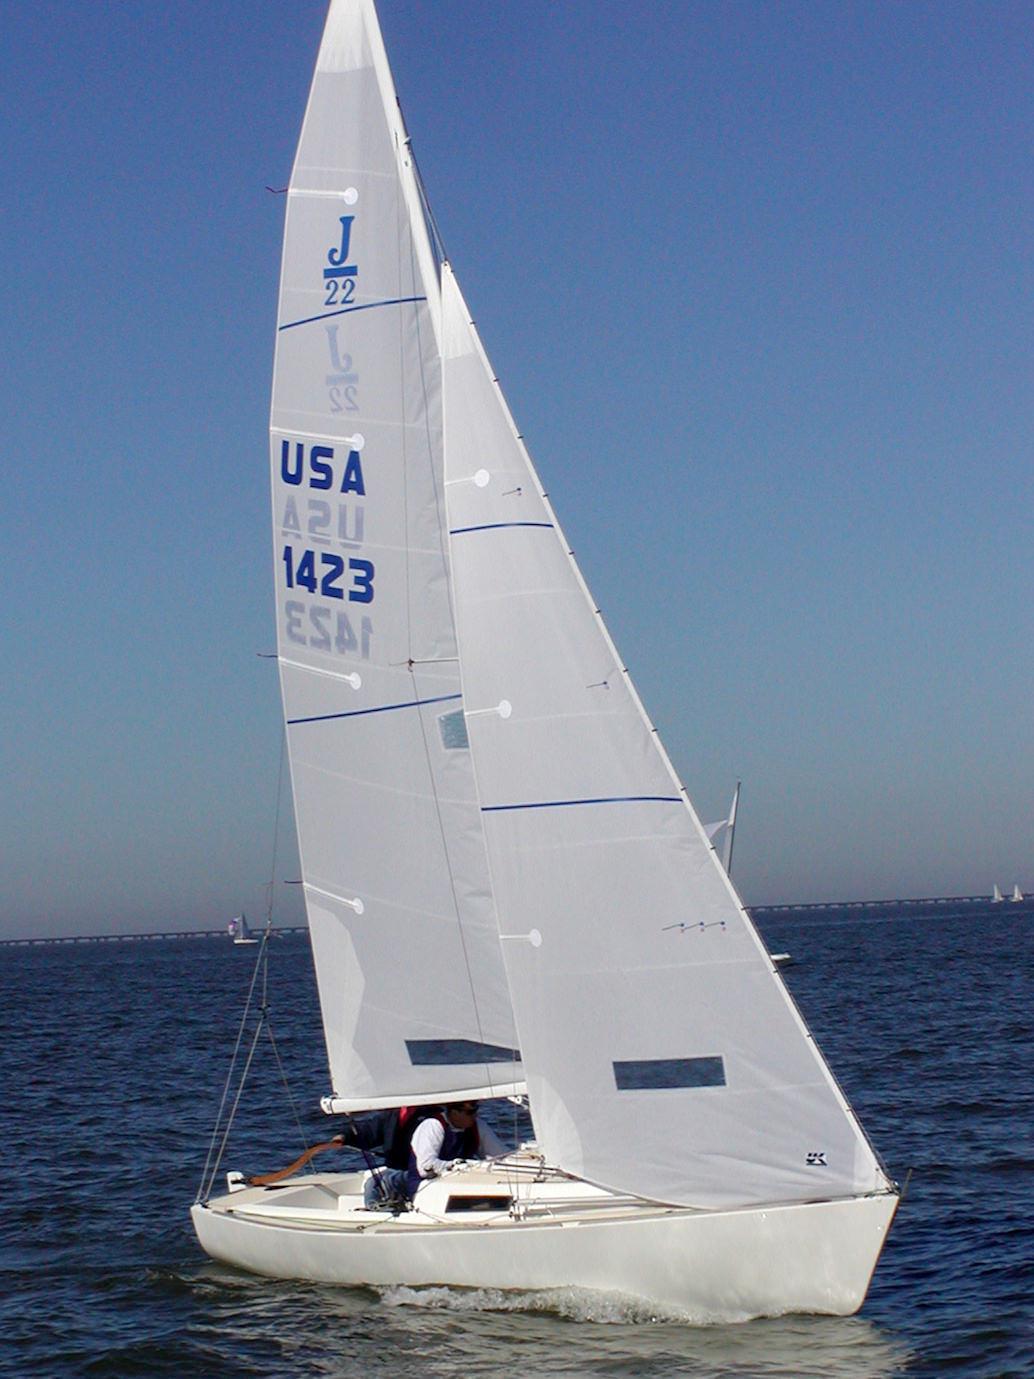 J/22 UK Sailmakers